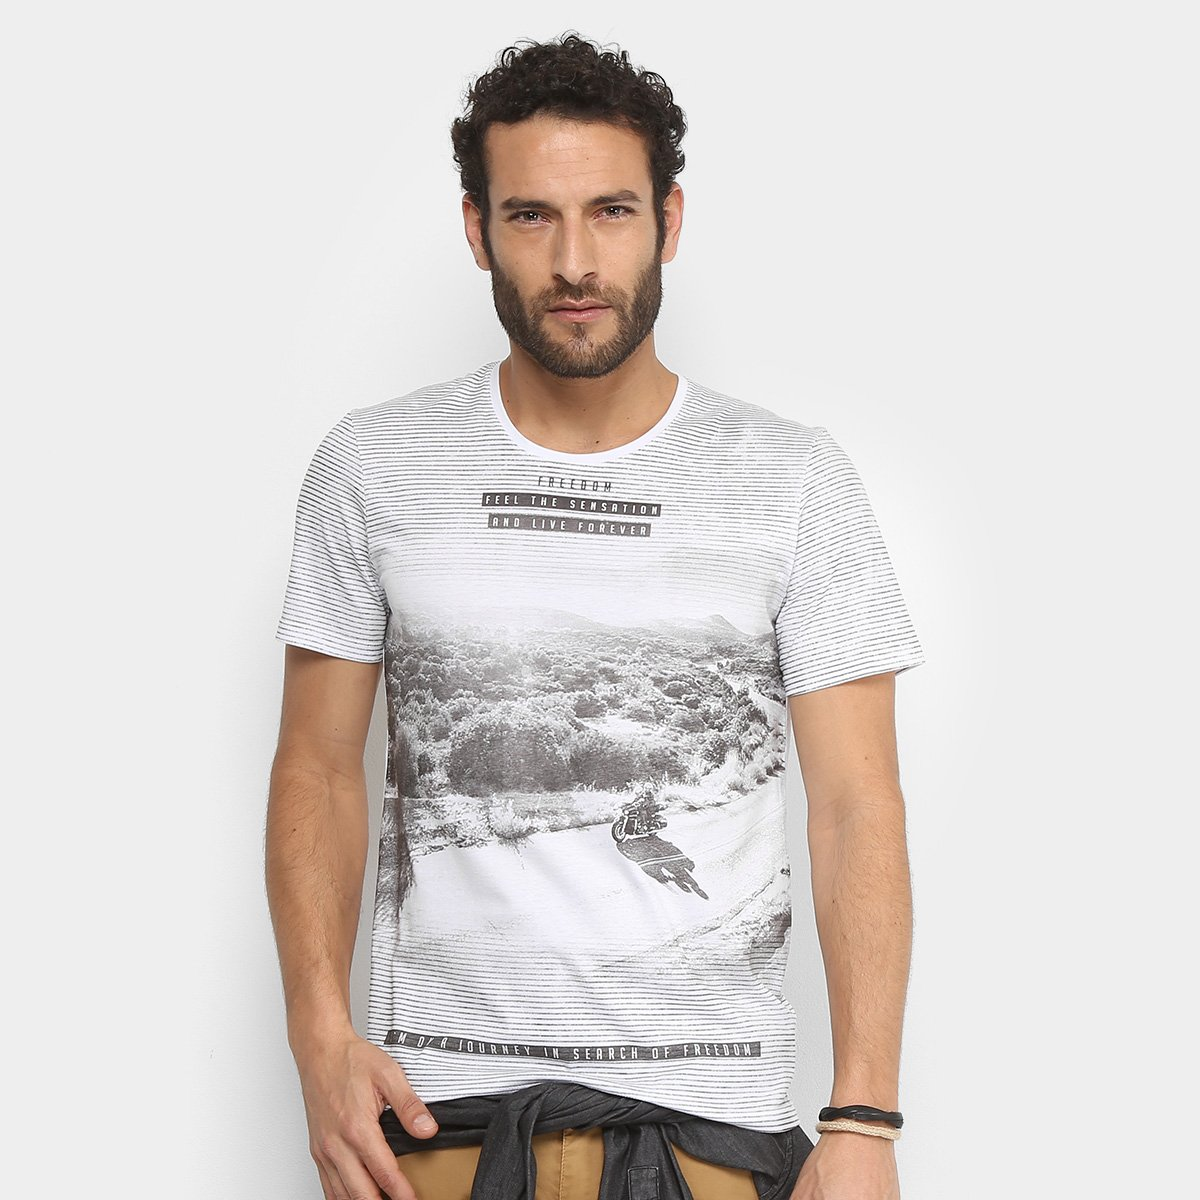 c707de81a1 Camiseta Kohmar Listrada Desert Riders Masculina